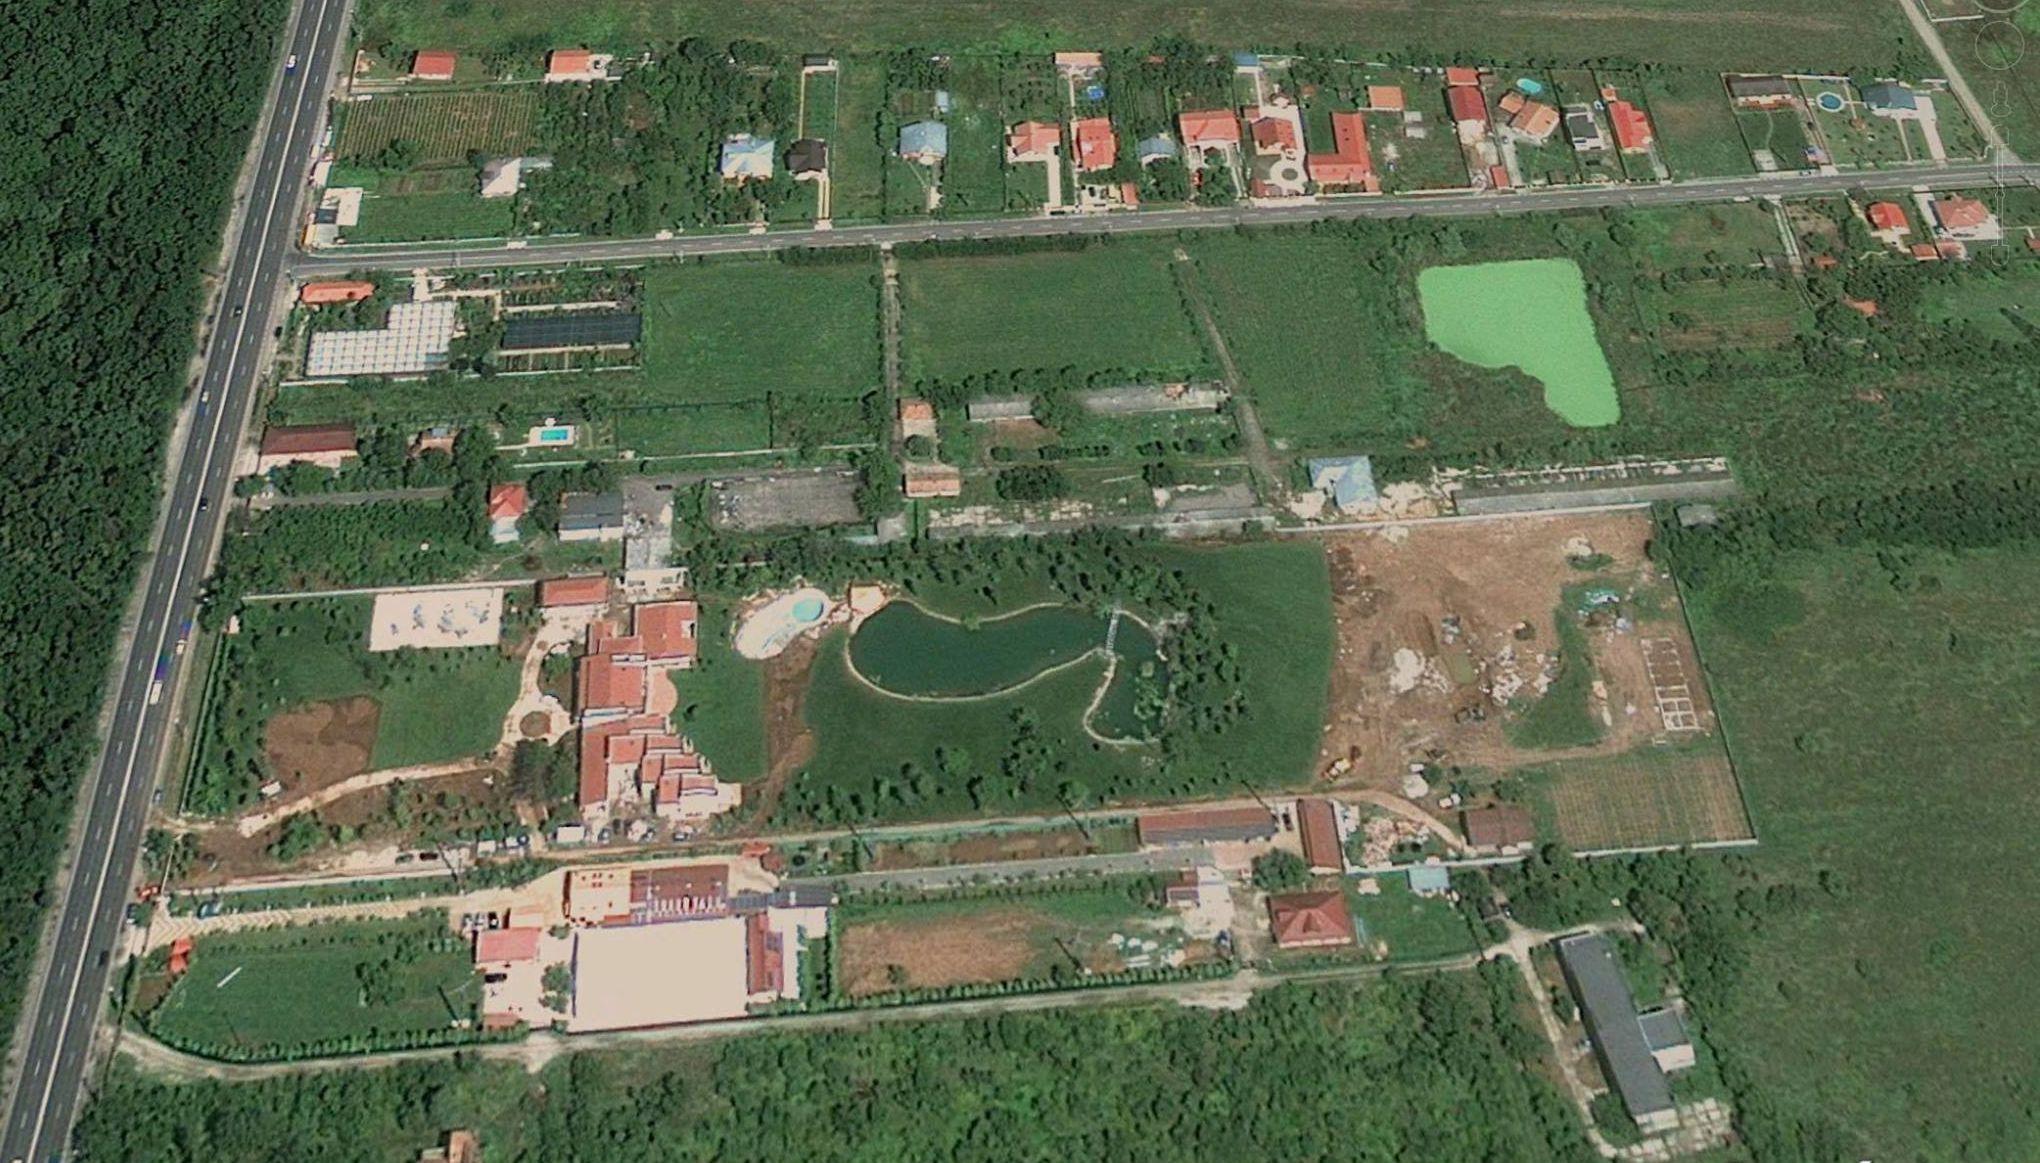 adelaparvu.com despre gradina amenjata de arh Dragos Isacescu, Foto Google Earth 1 (4)